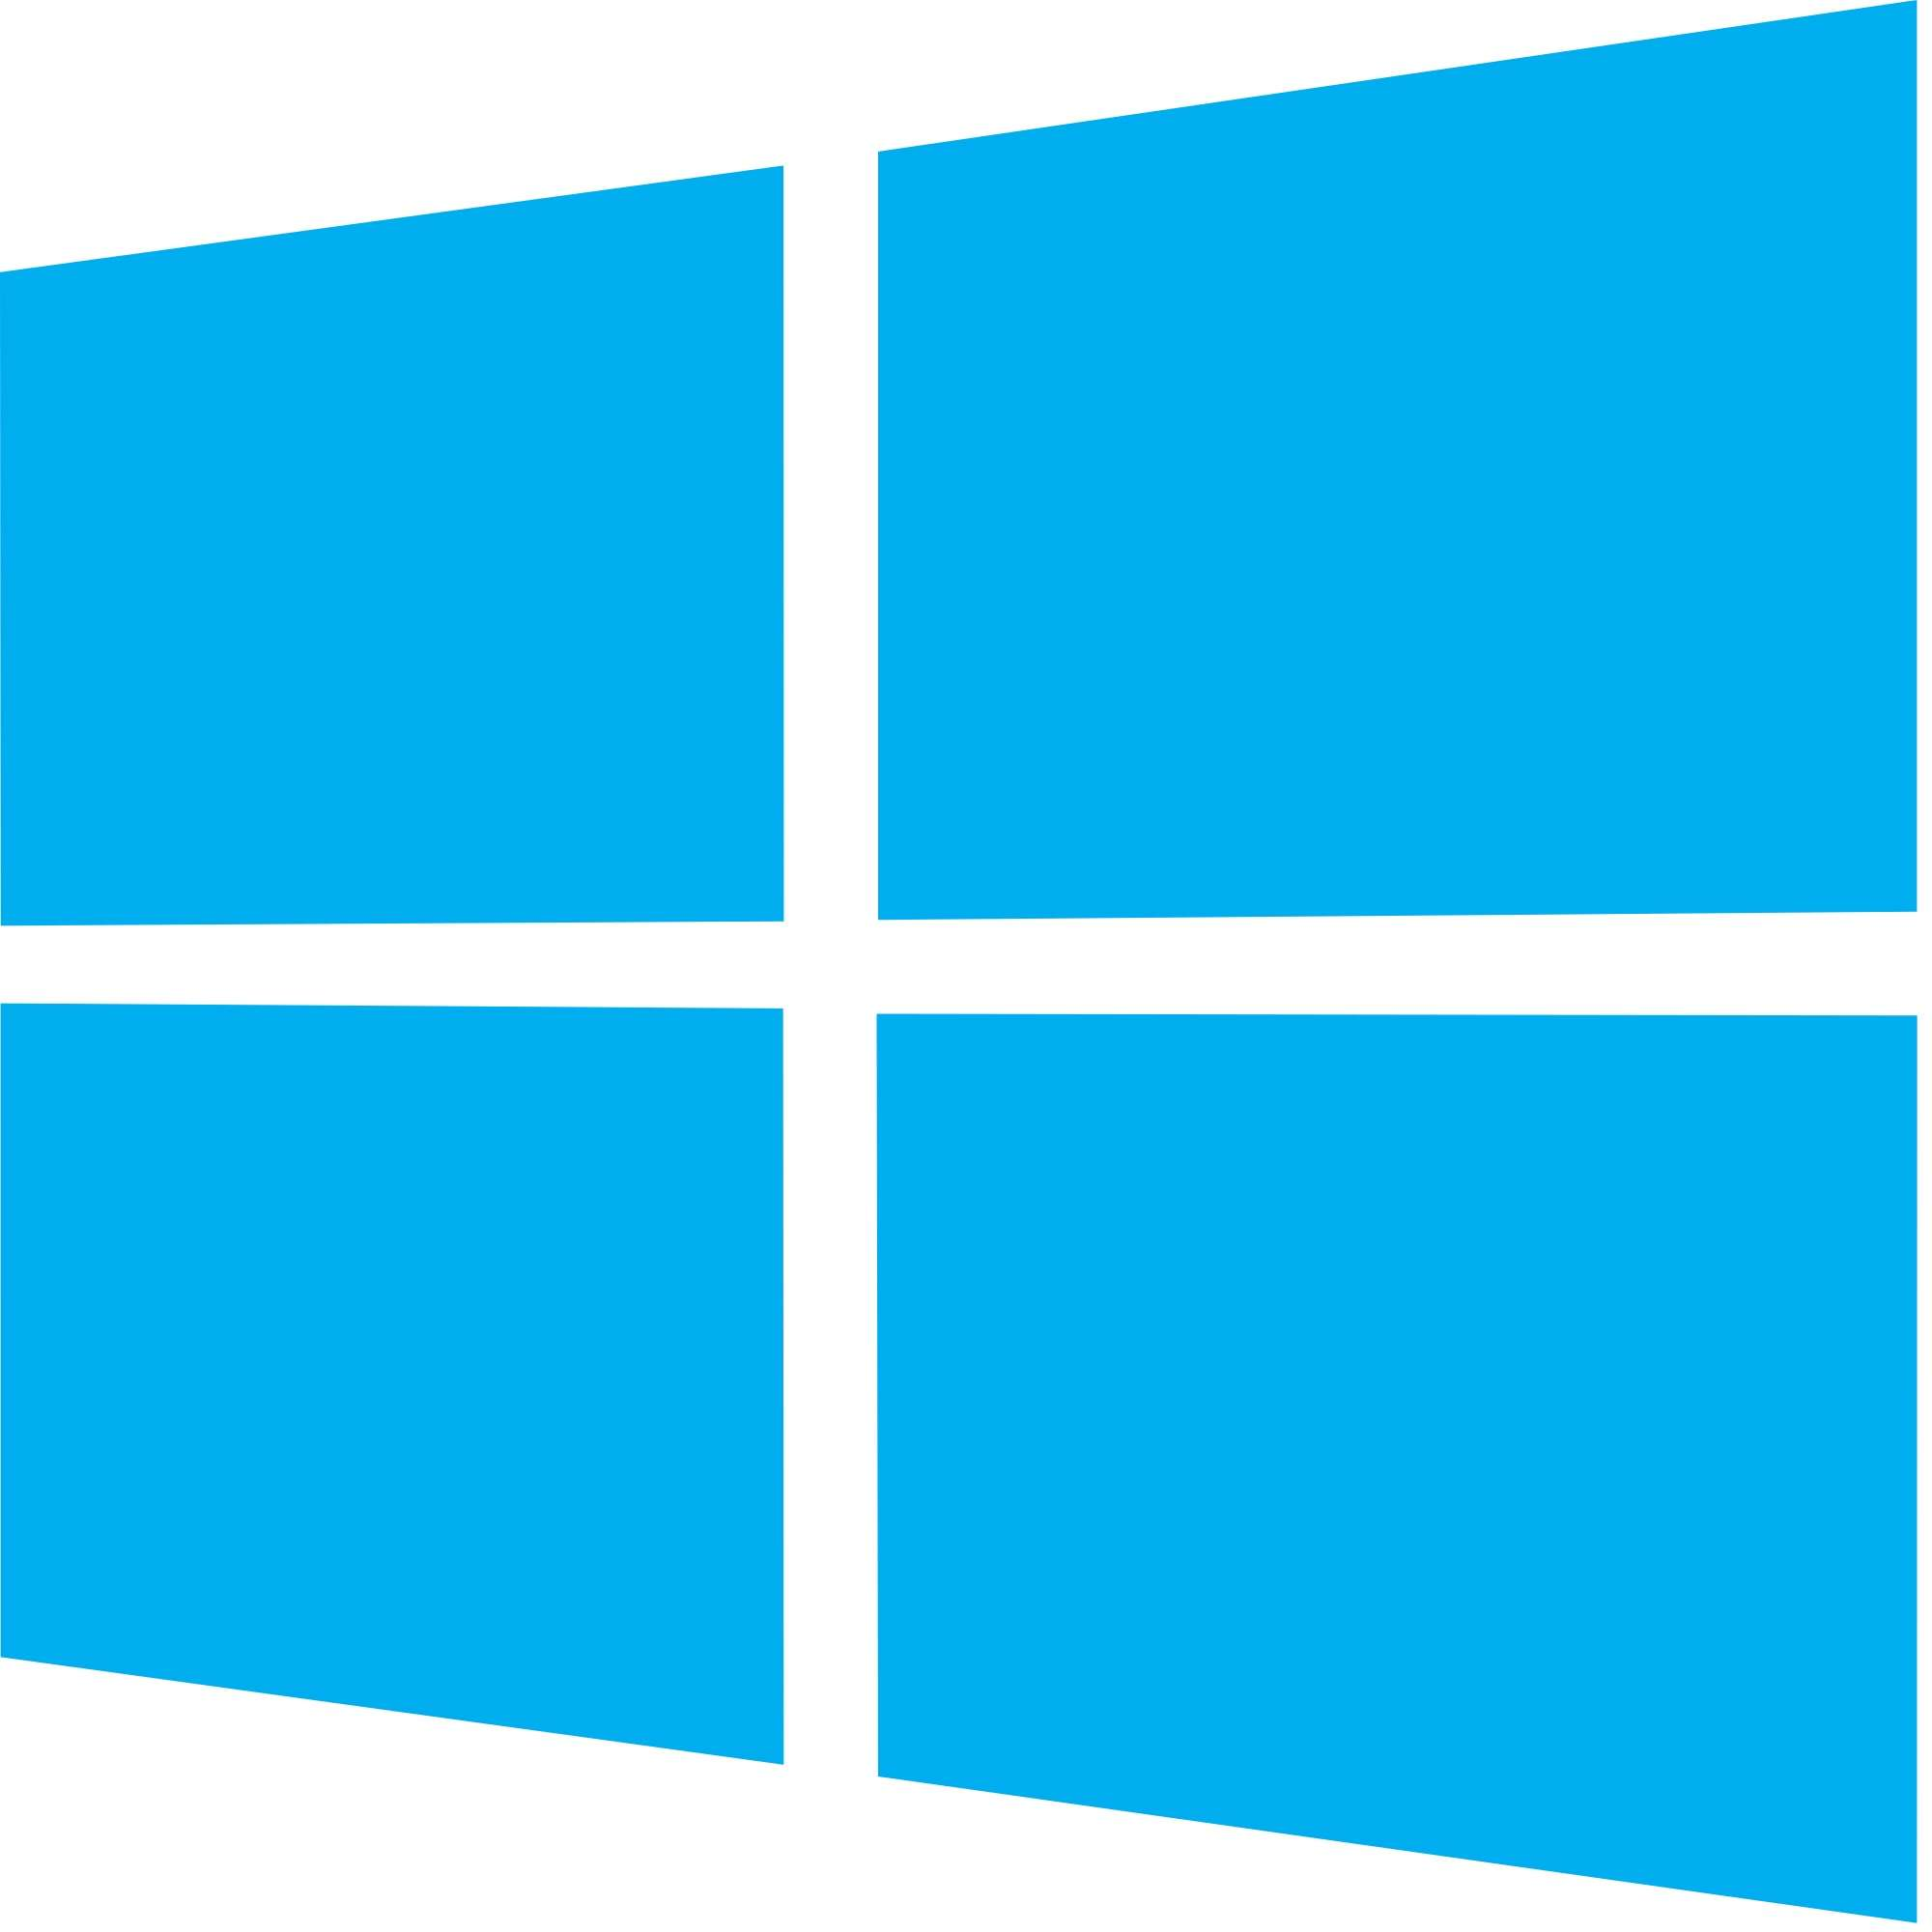 Ms Windows clipart Microsoft the by logo Windows